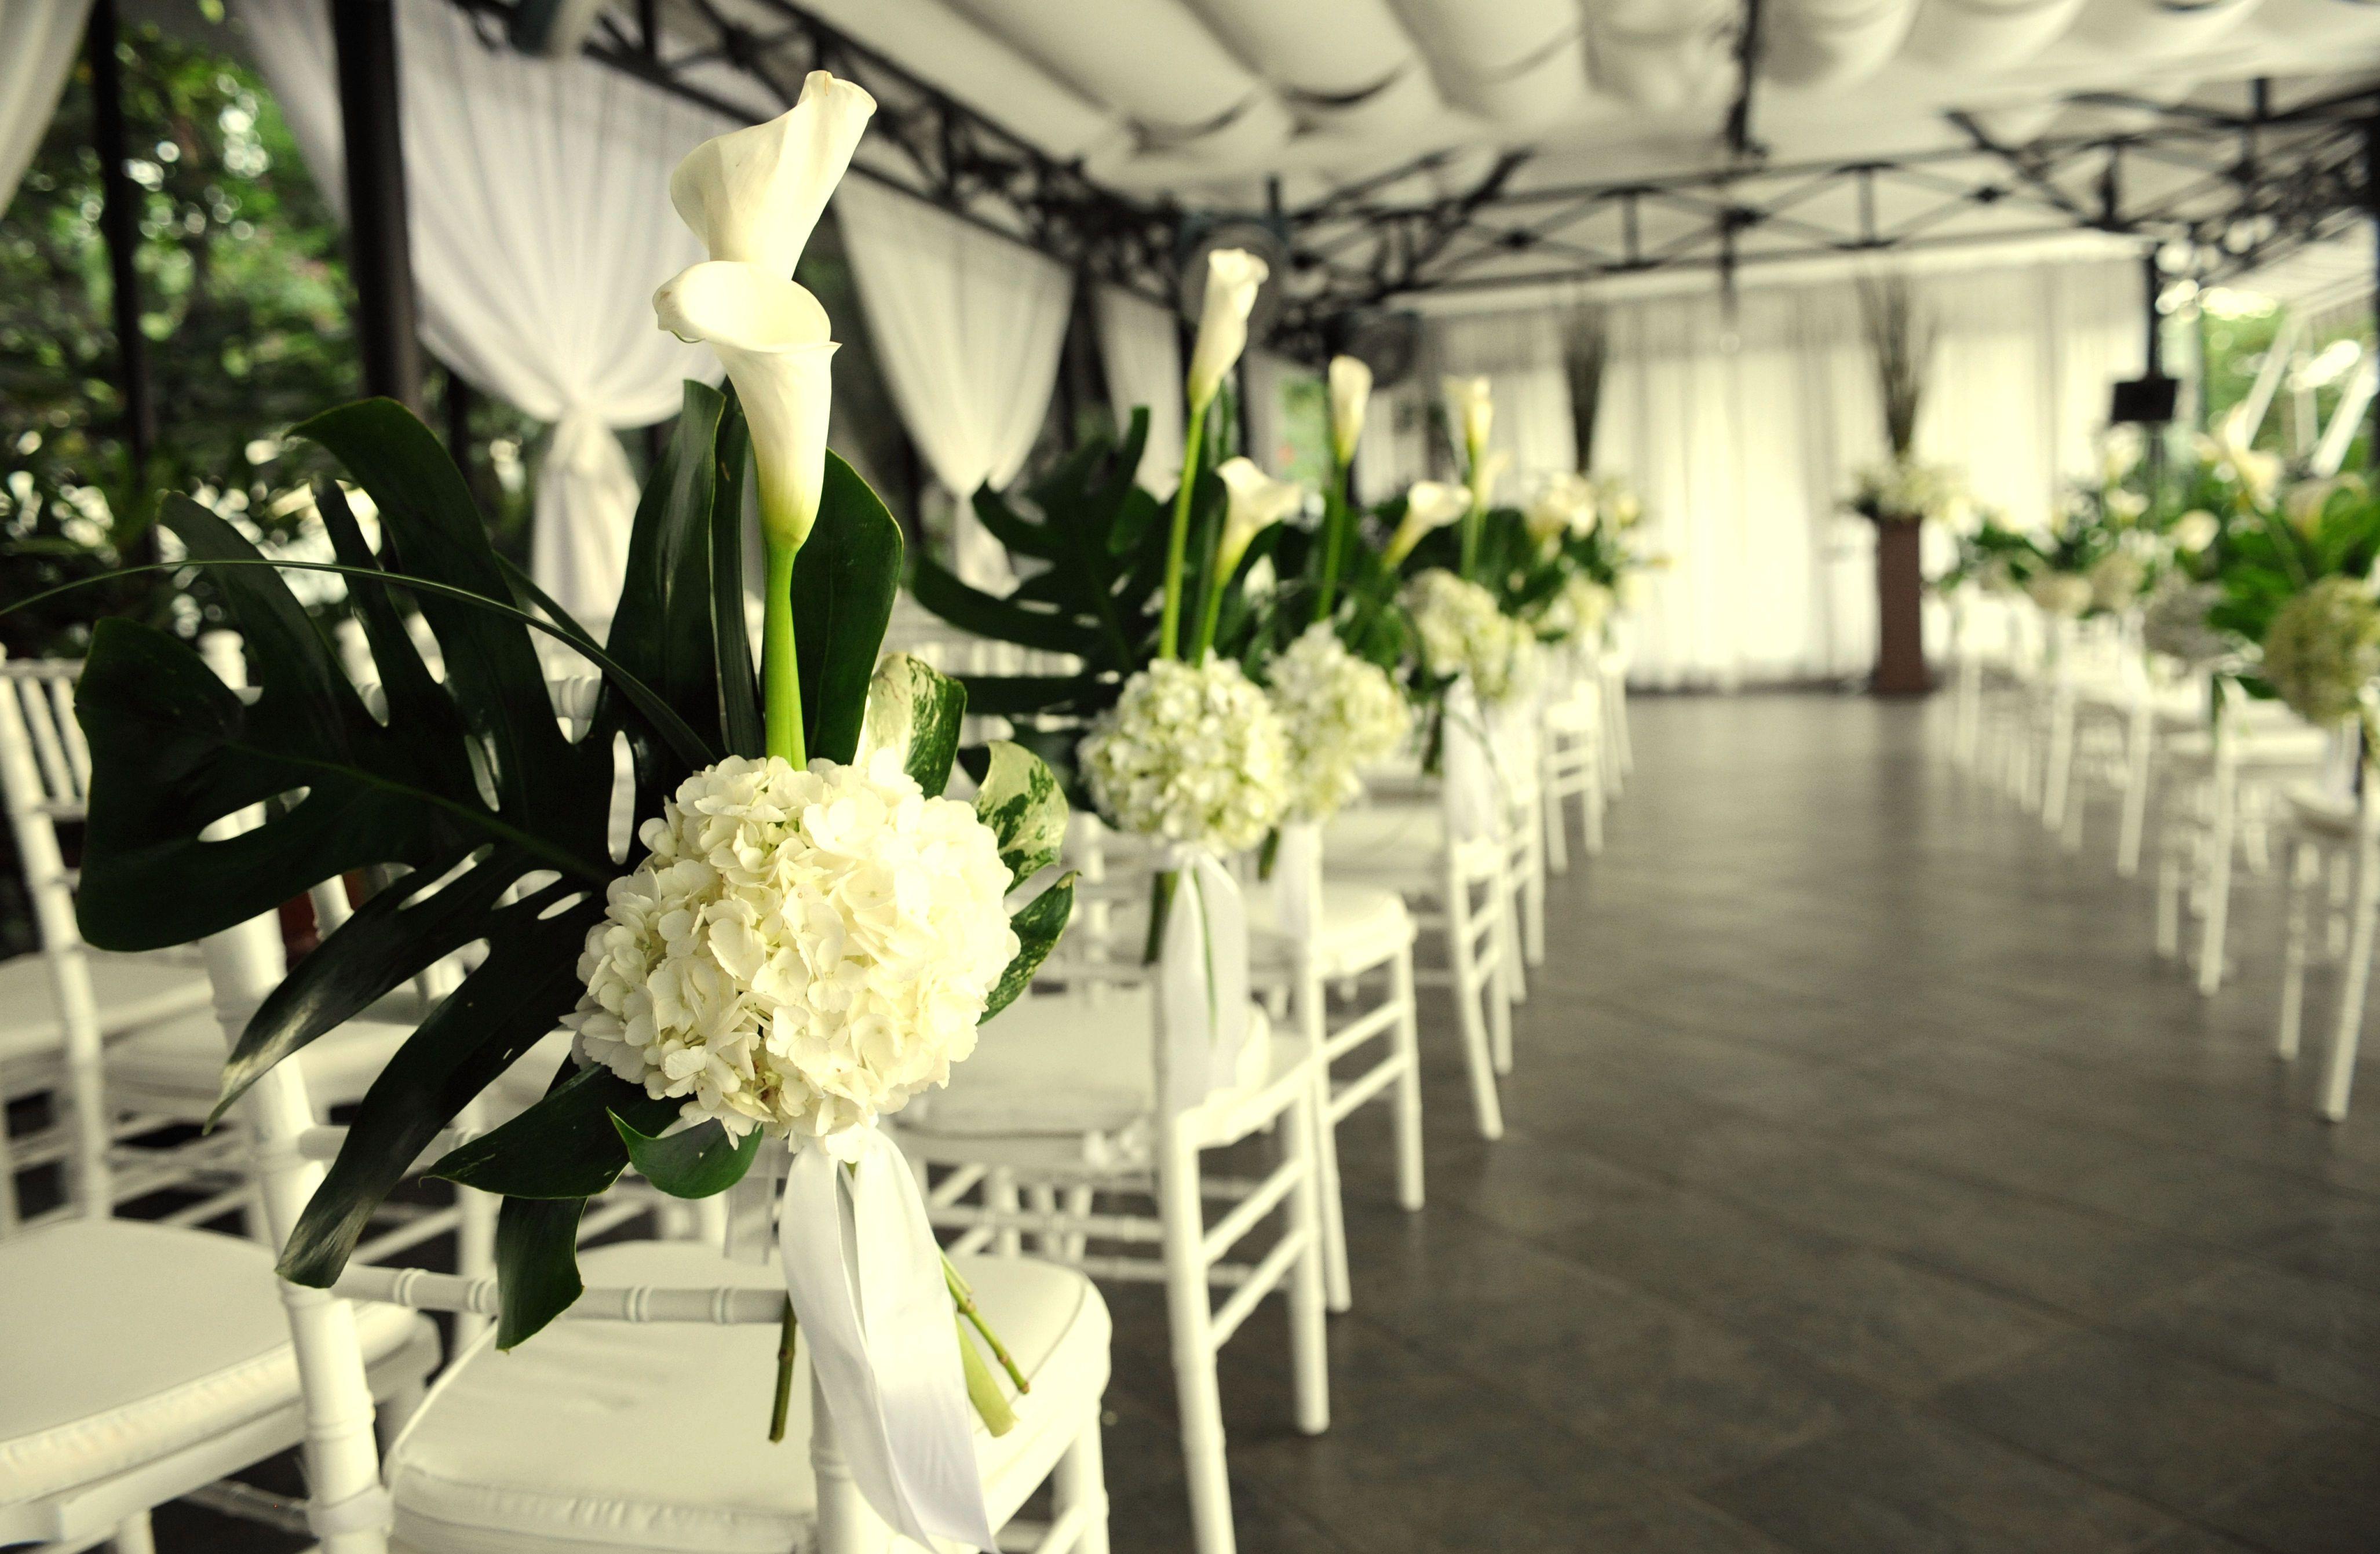 Wedding aisle decor ideas diy  Deco para la ceremonia  Decoracion para boda  Pinterest